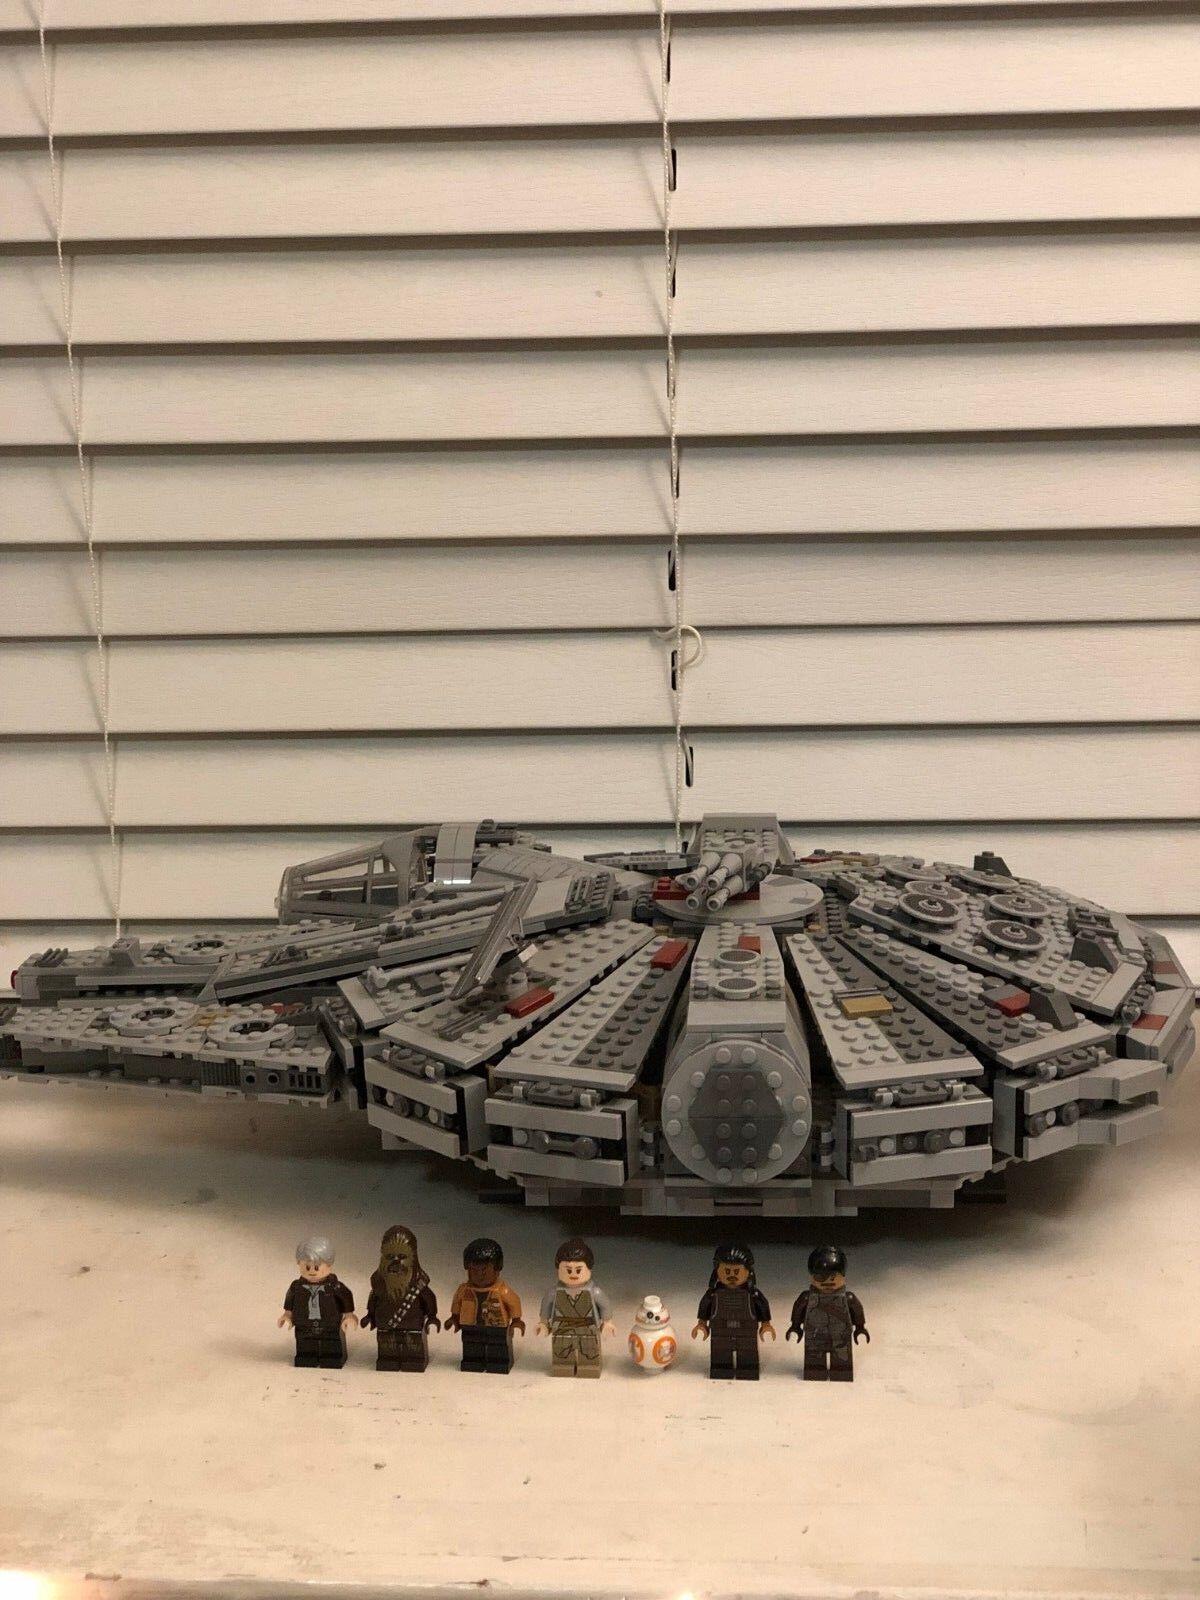 LEGO 75105 Millennium Falcon Out of Box See Description